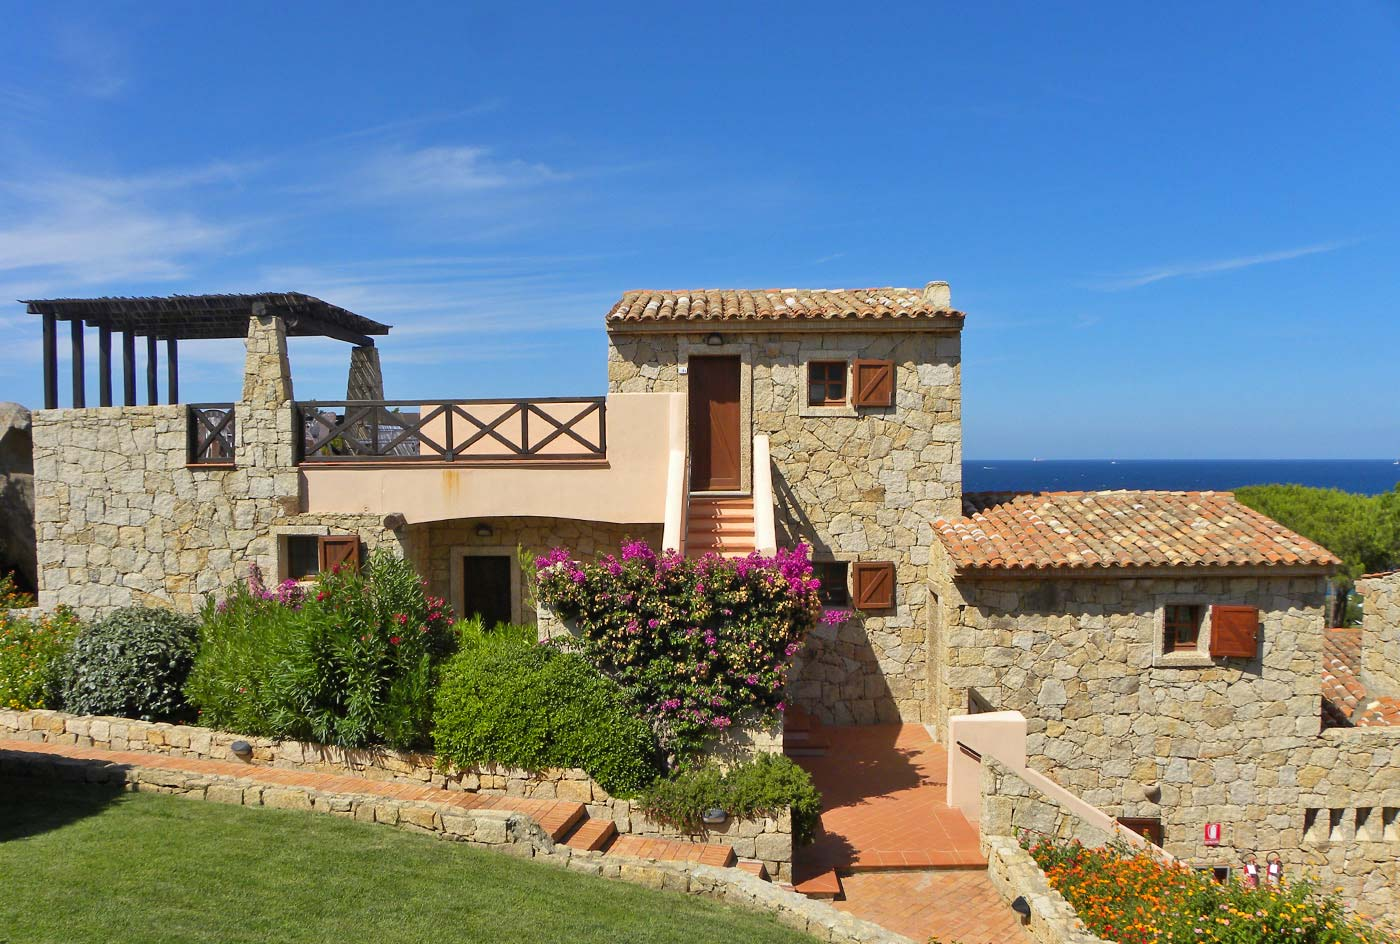 residence sul mare costa smeralda baja sardinia hotel